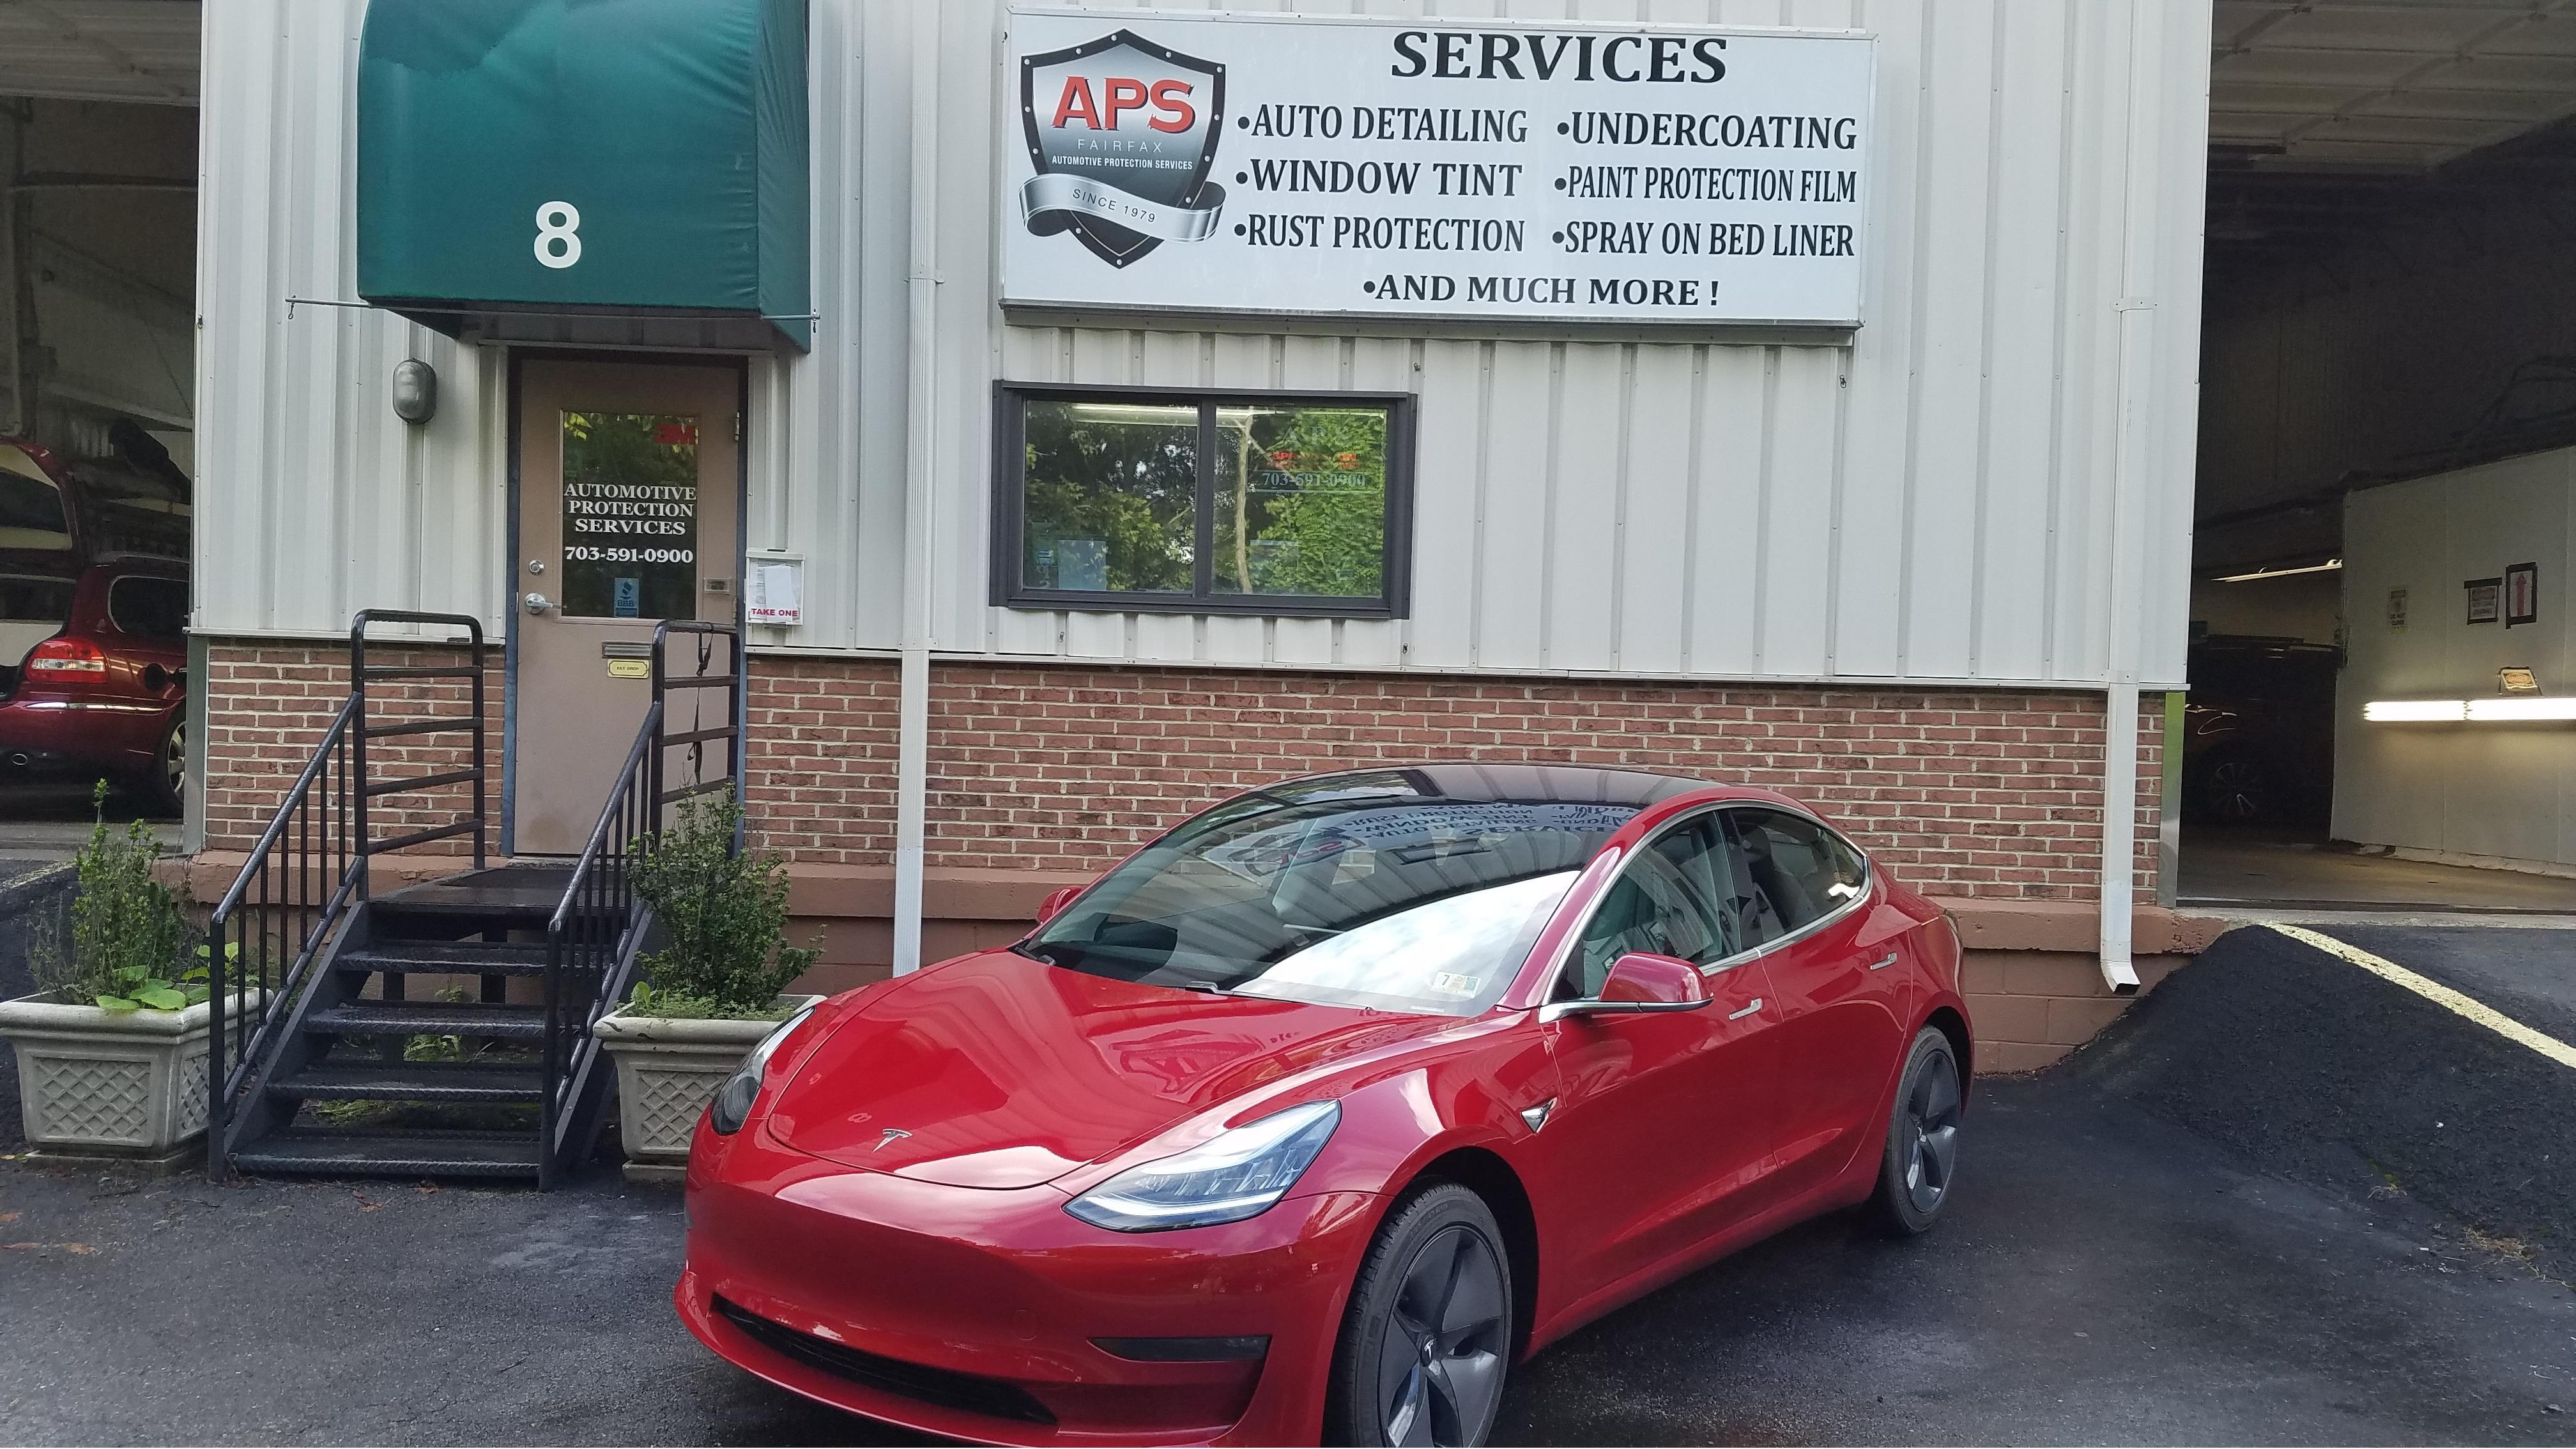 Automotive Protection Services Fairfax Virginia Va